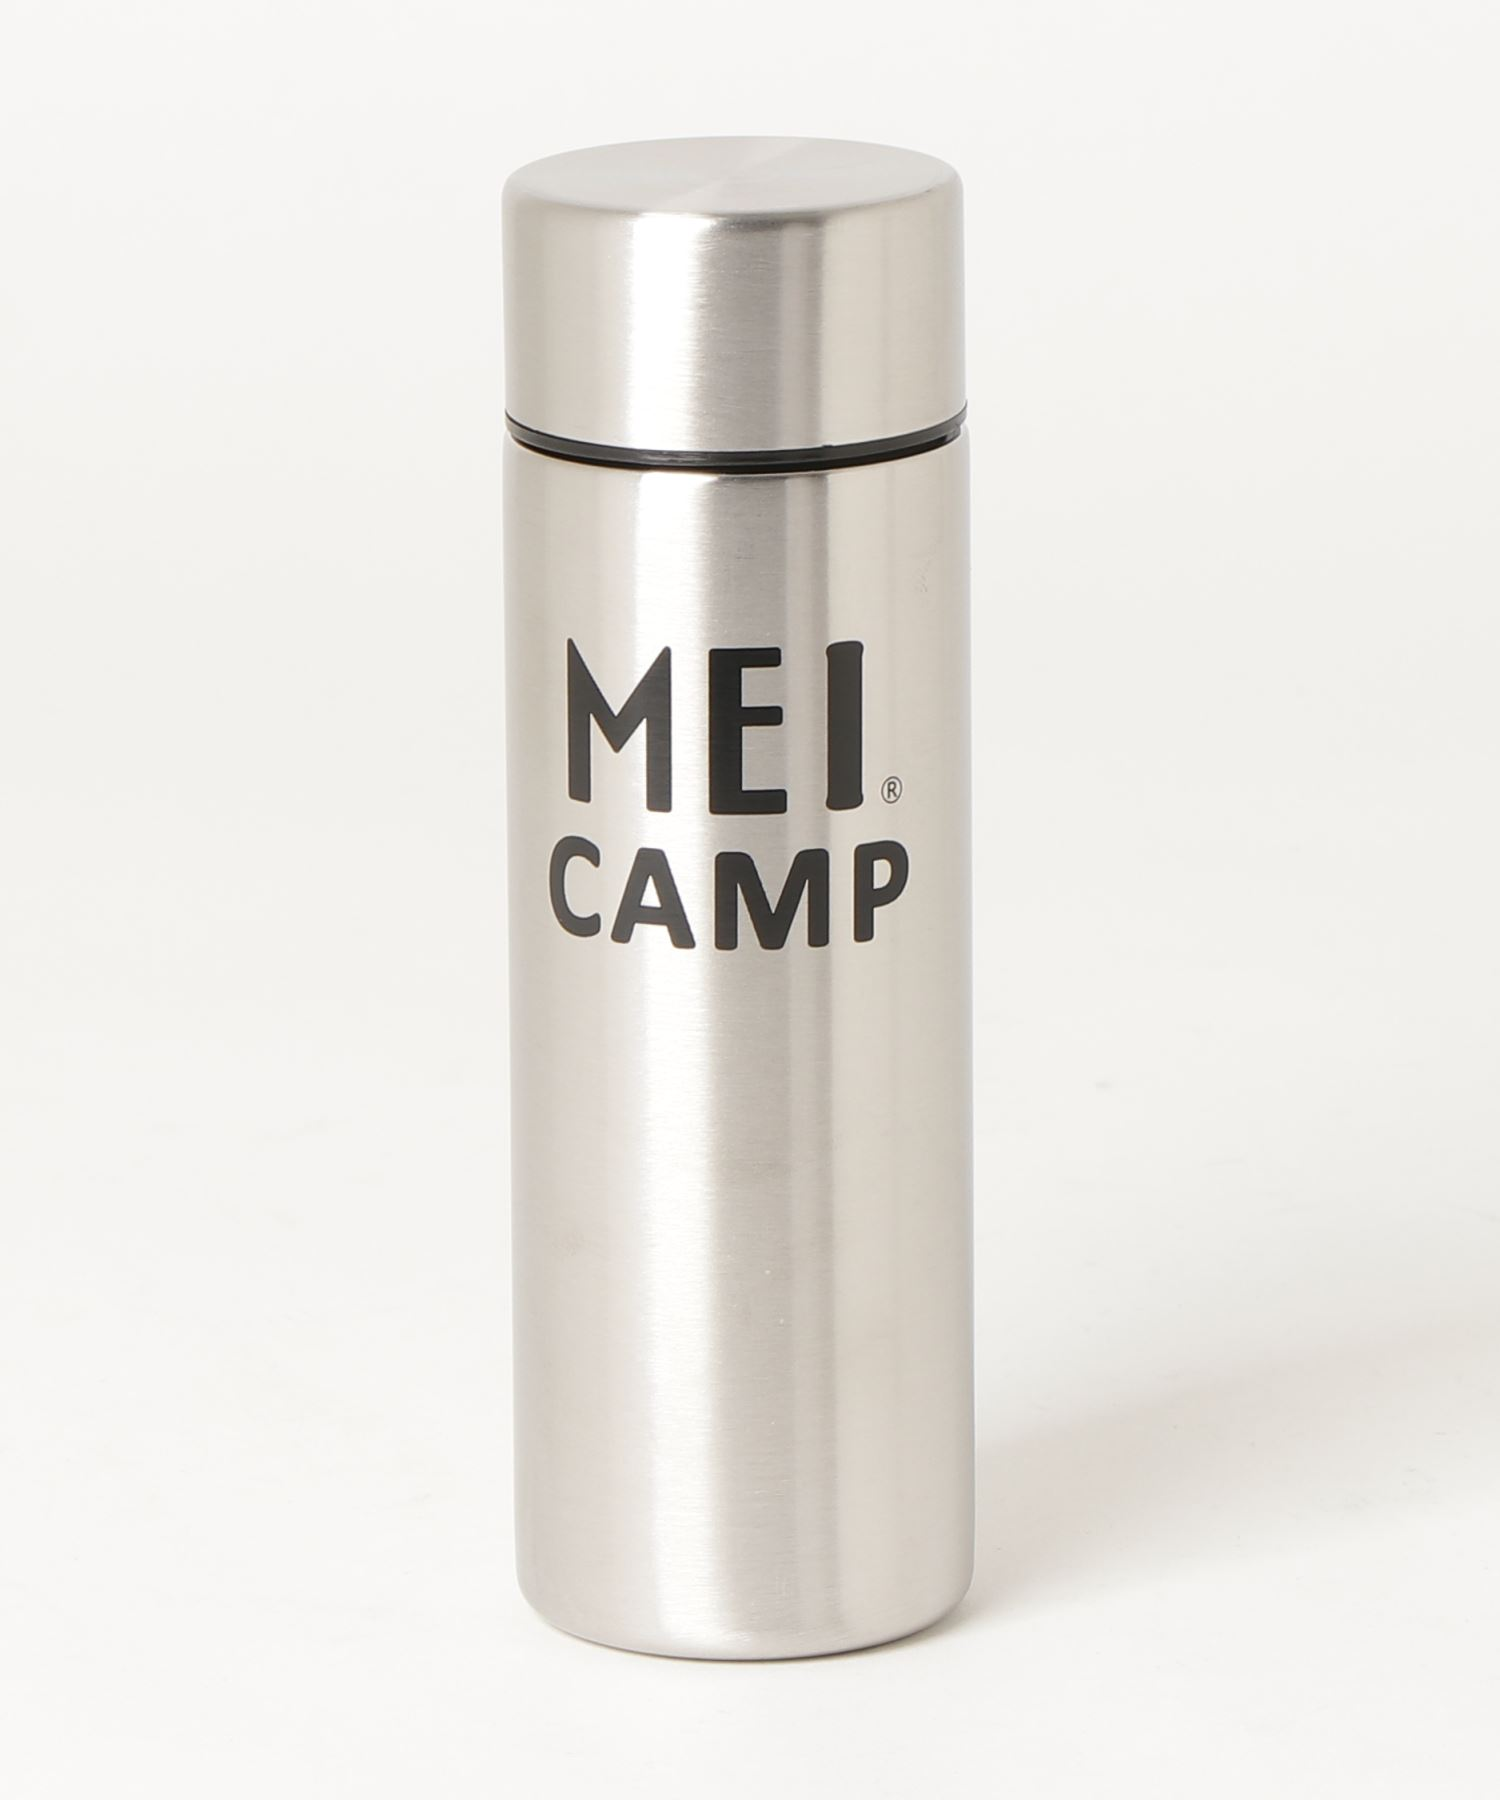 【 MEI CAMP / メイキャンプ 】 ポケットサーモボトル 水筒 130ml